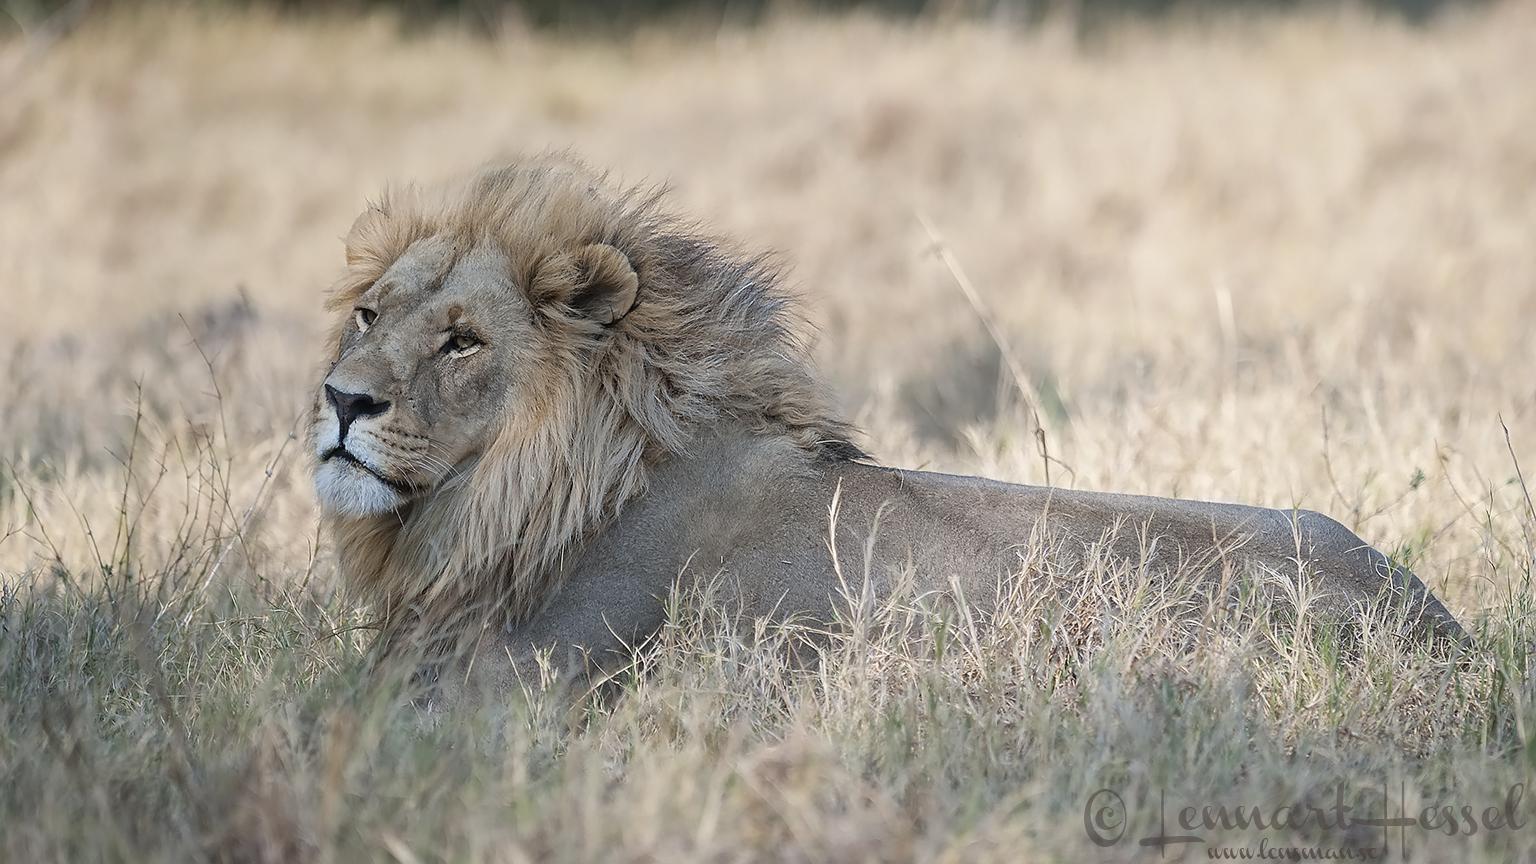 Male Lion in Khwai Community Area, Botswana